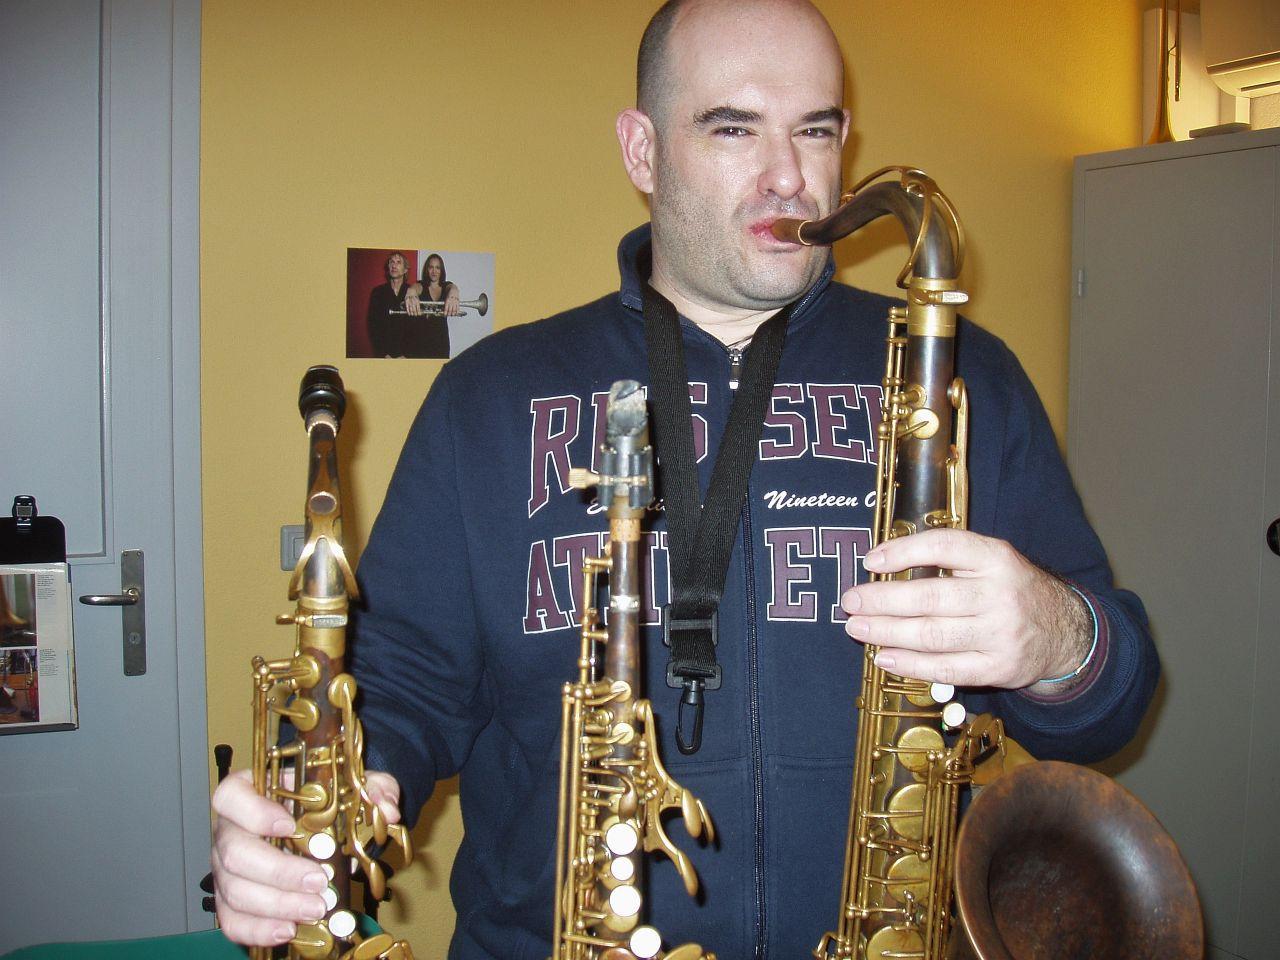 Musiker 118